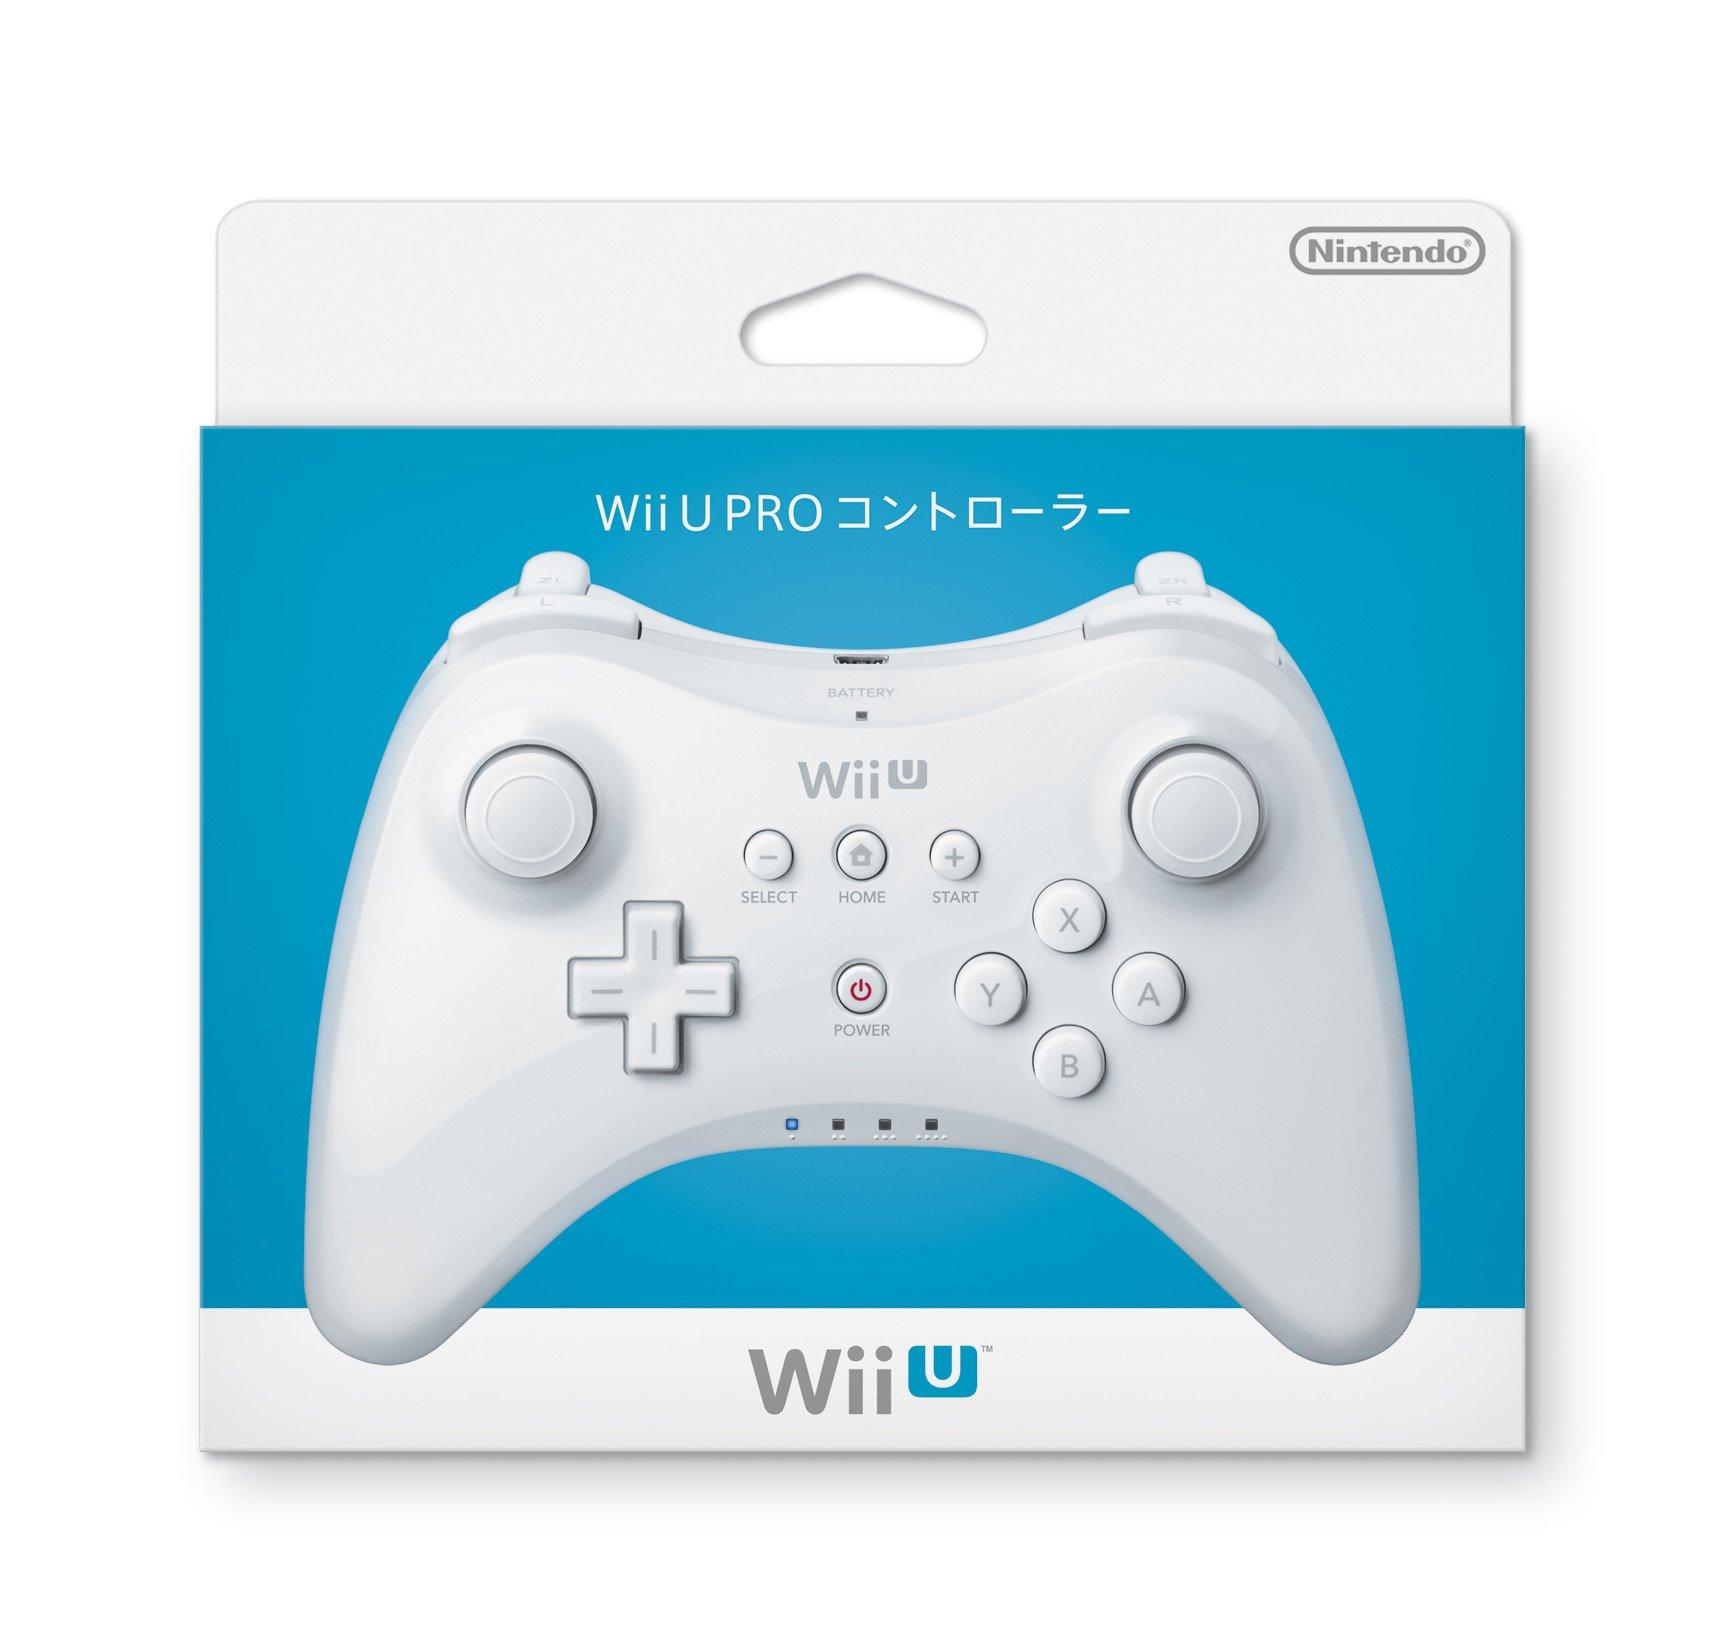 Nintendo - wuparswa - wii u pro controller - white